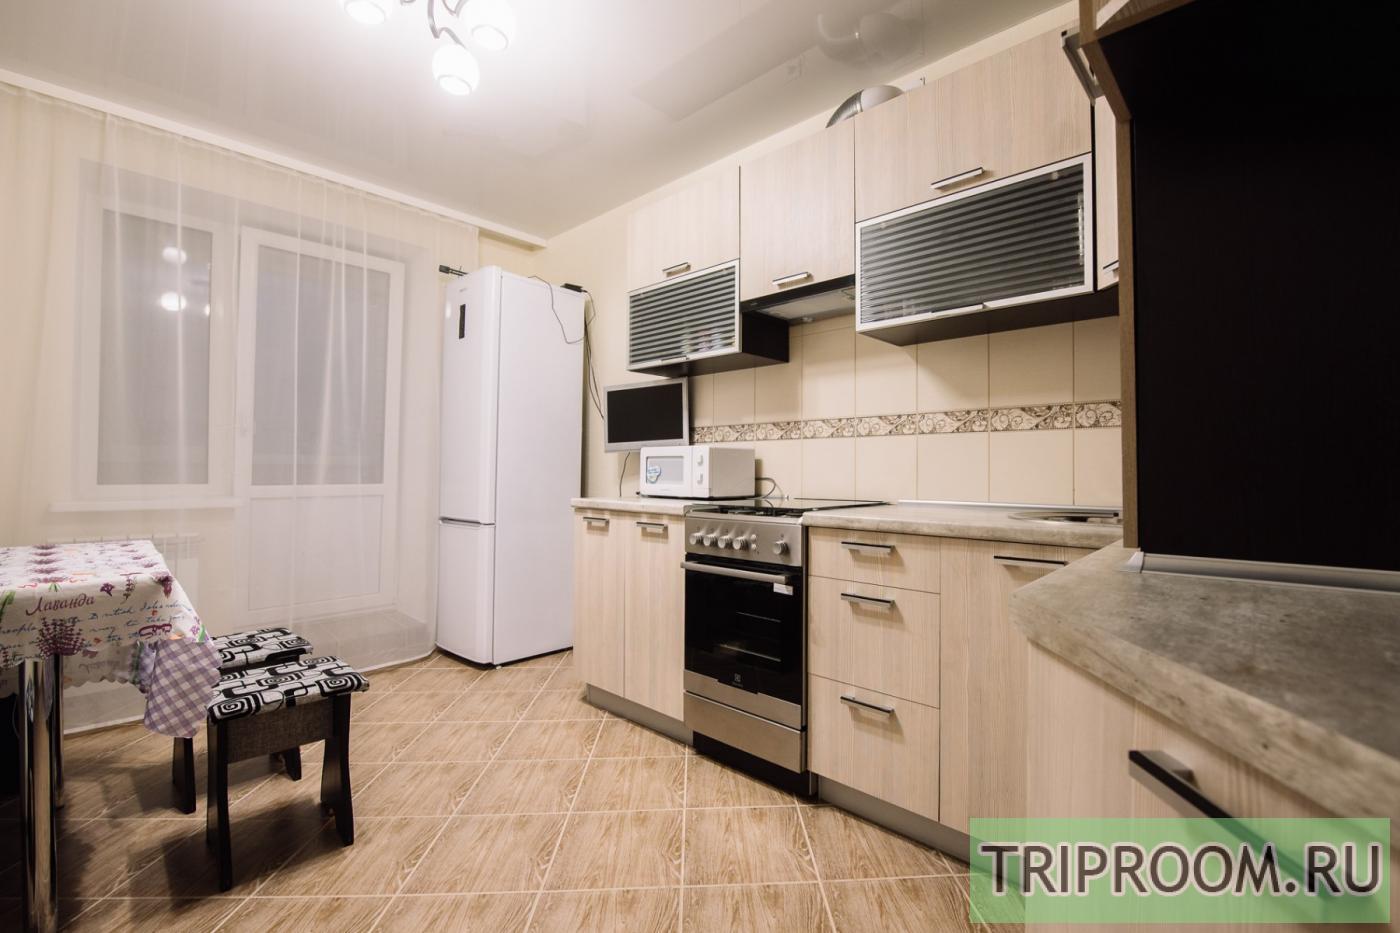 1-комнатная квартира посуточно (вариант № 21616), ул. Нормандия-Неман, фото № 7